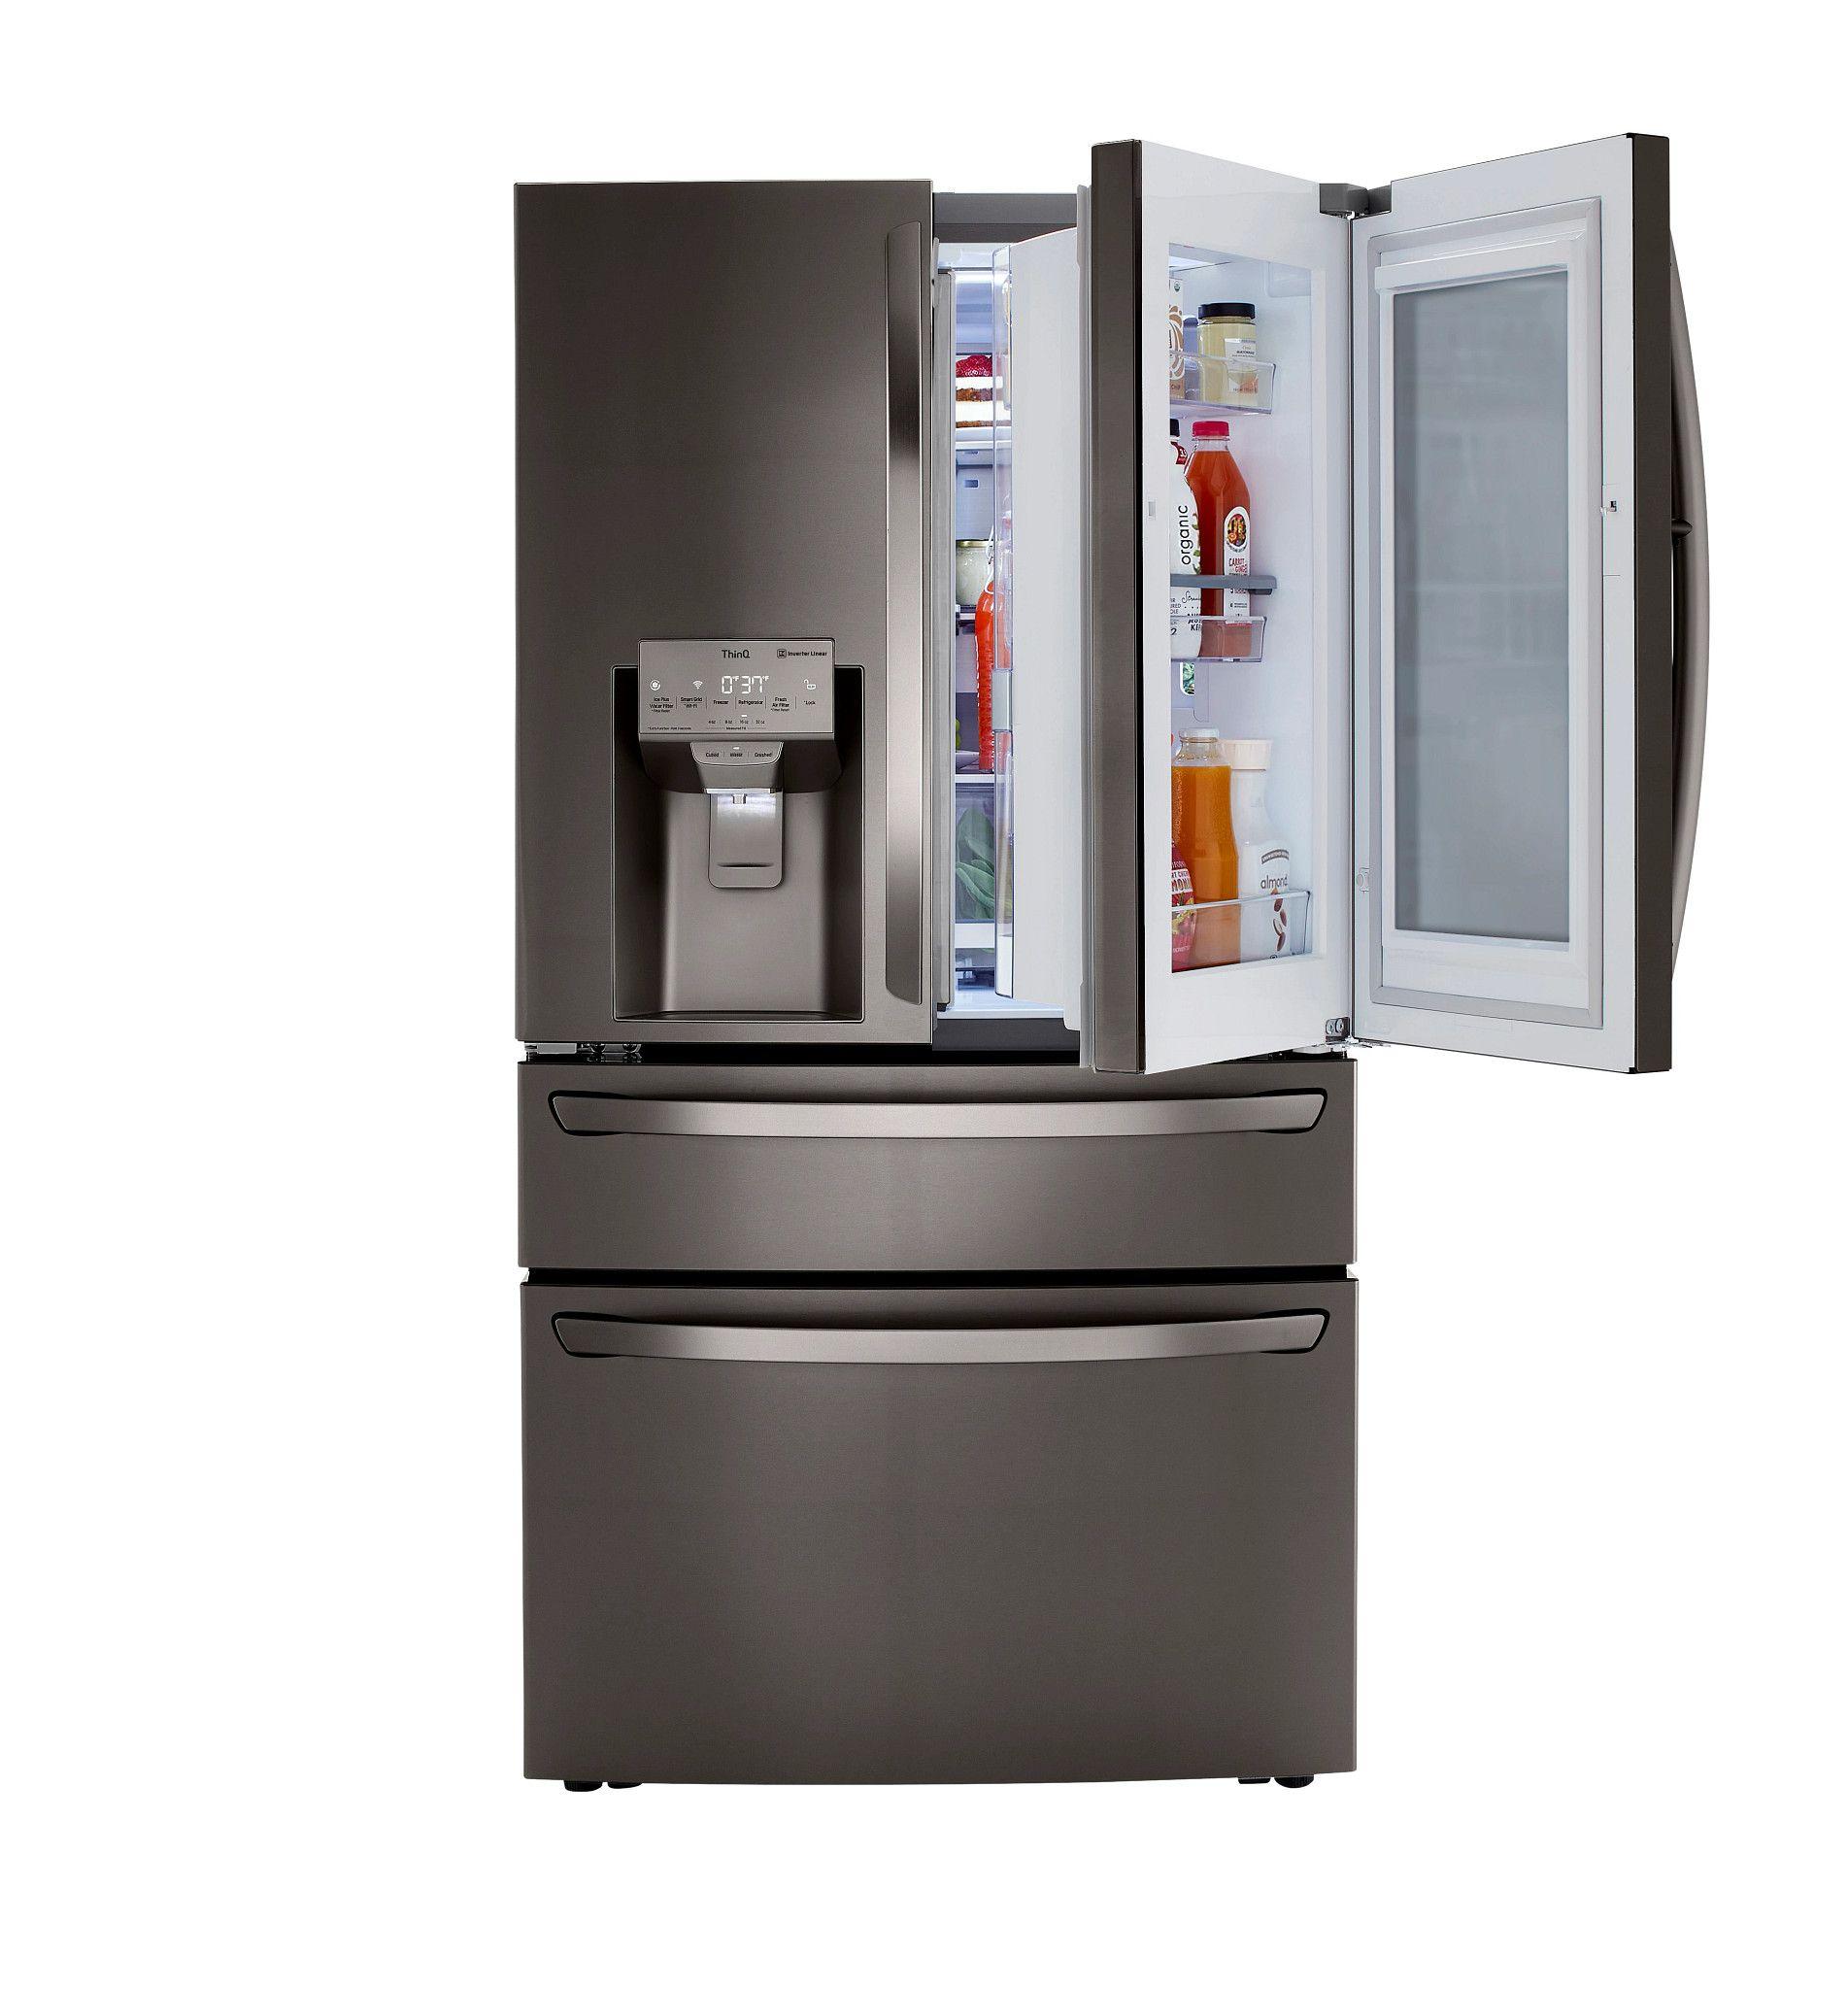 Latest Refrigerator Technologies